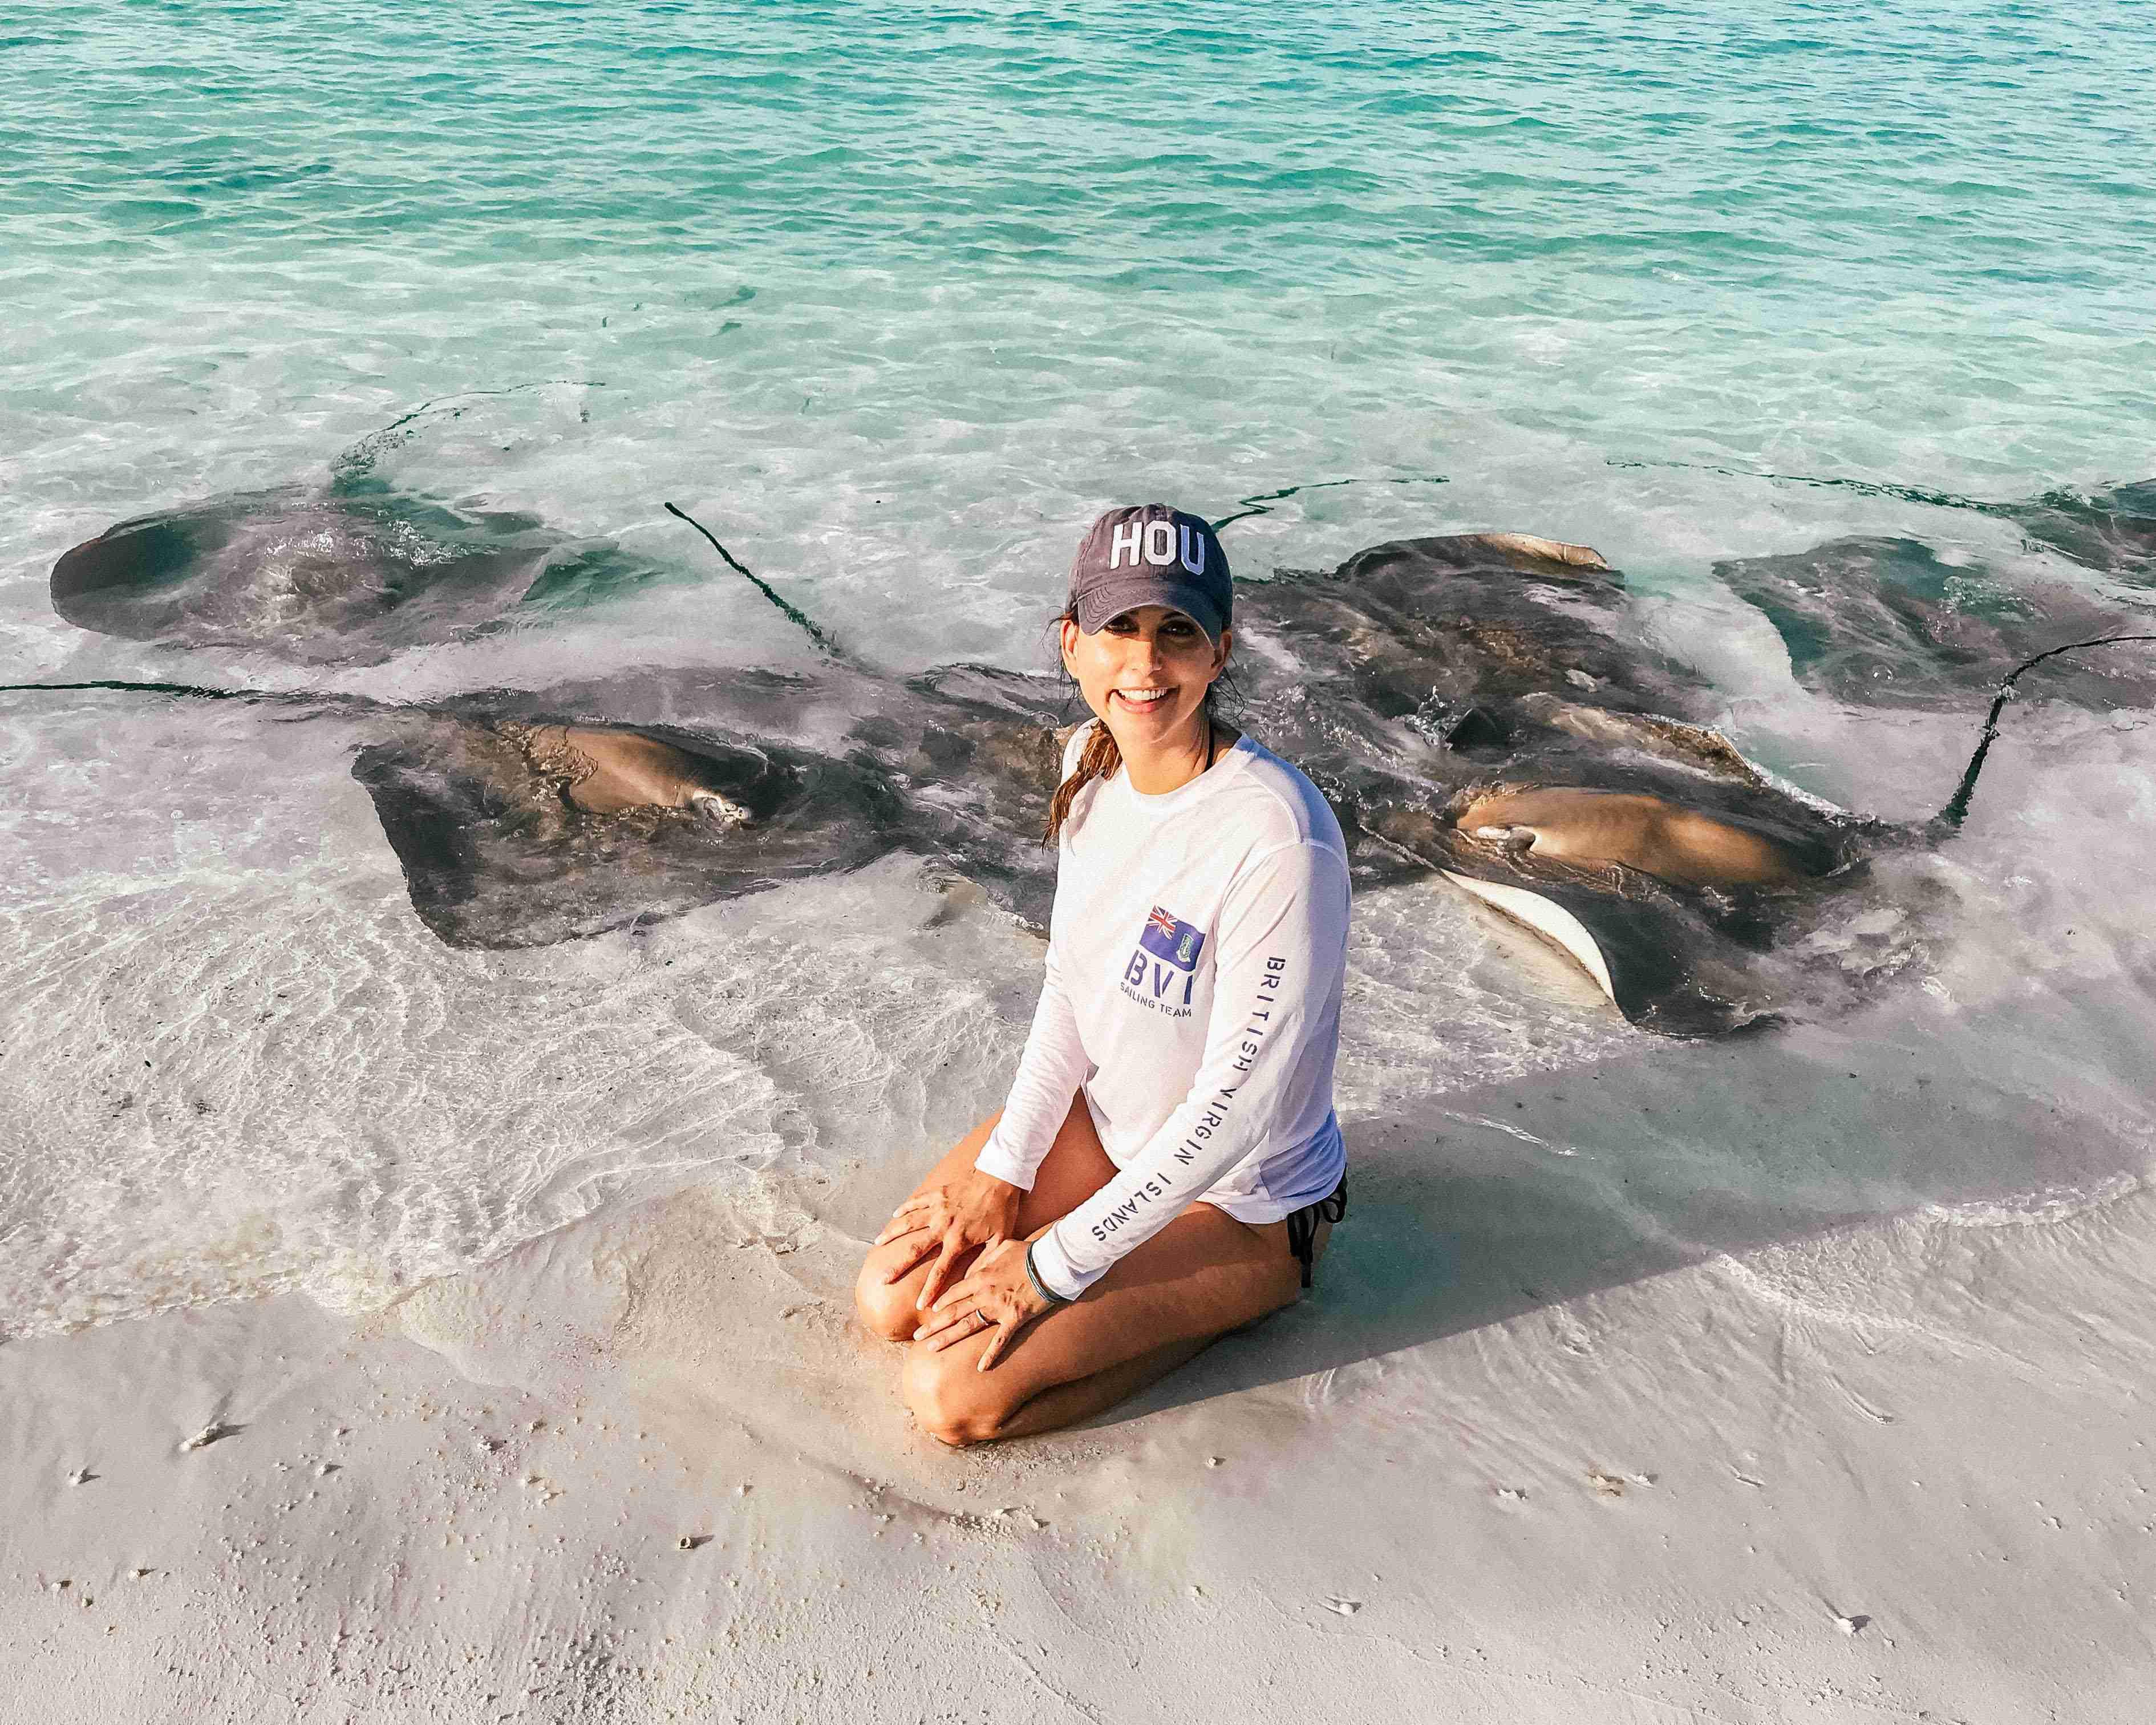 maldives vacation stingrays